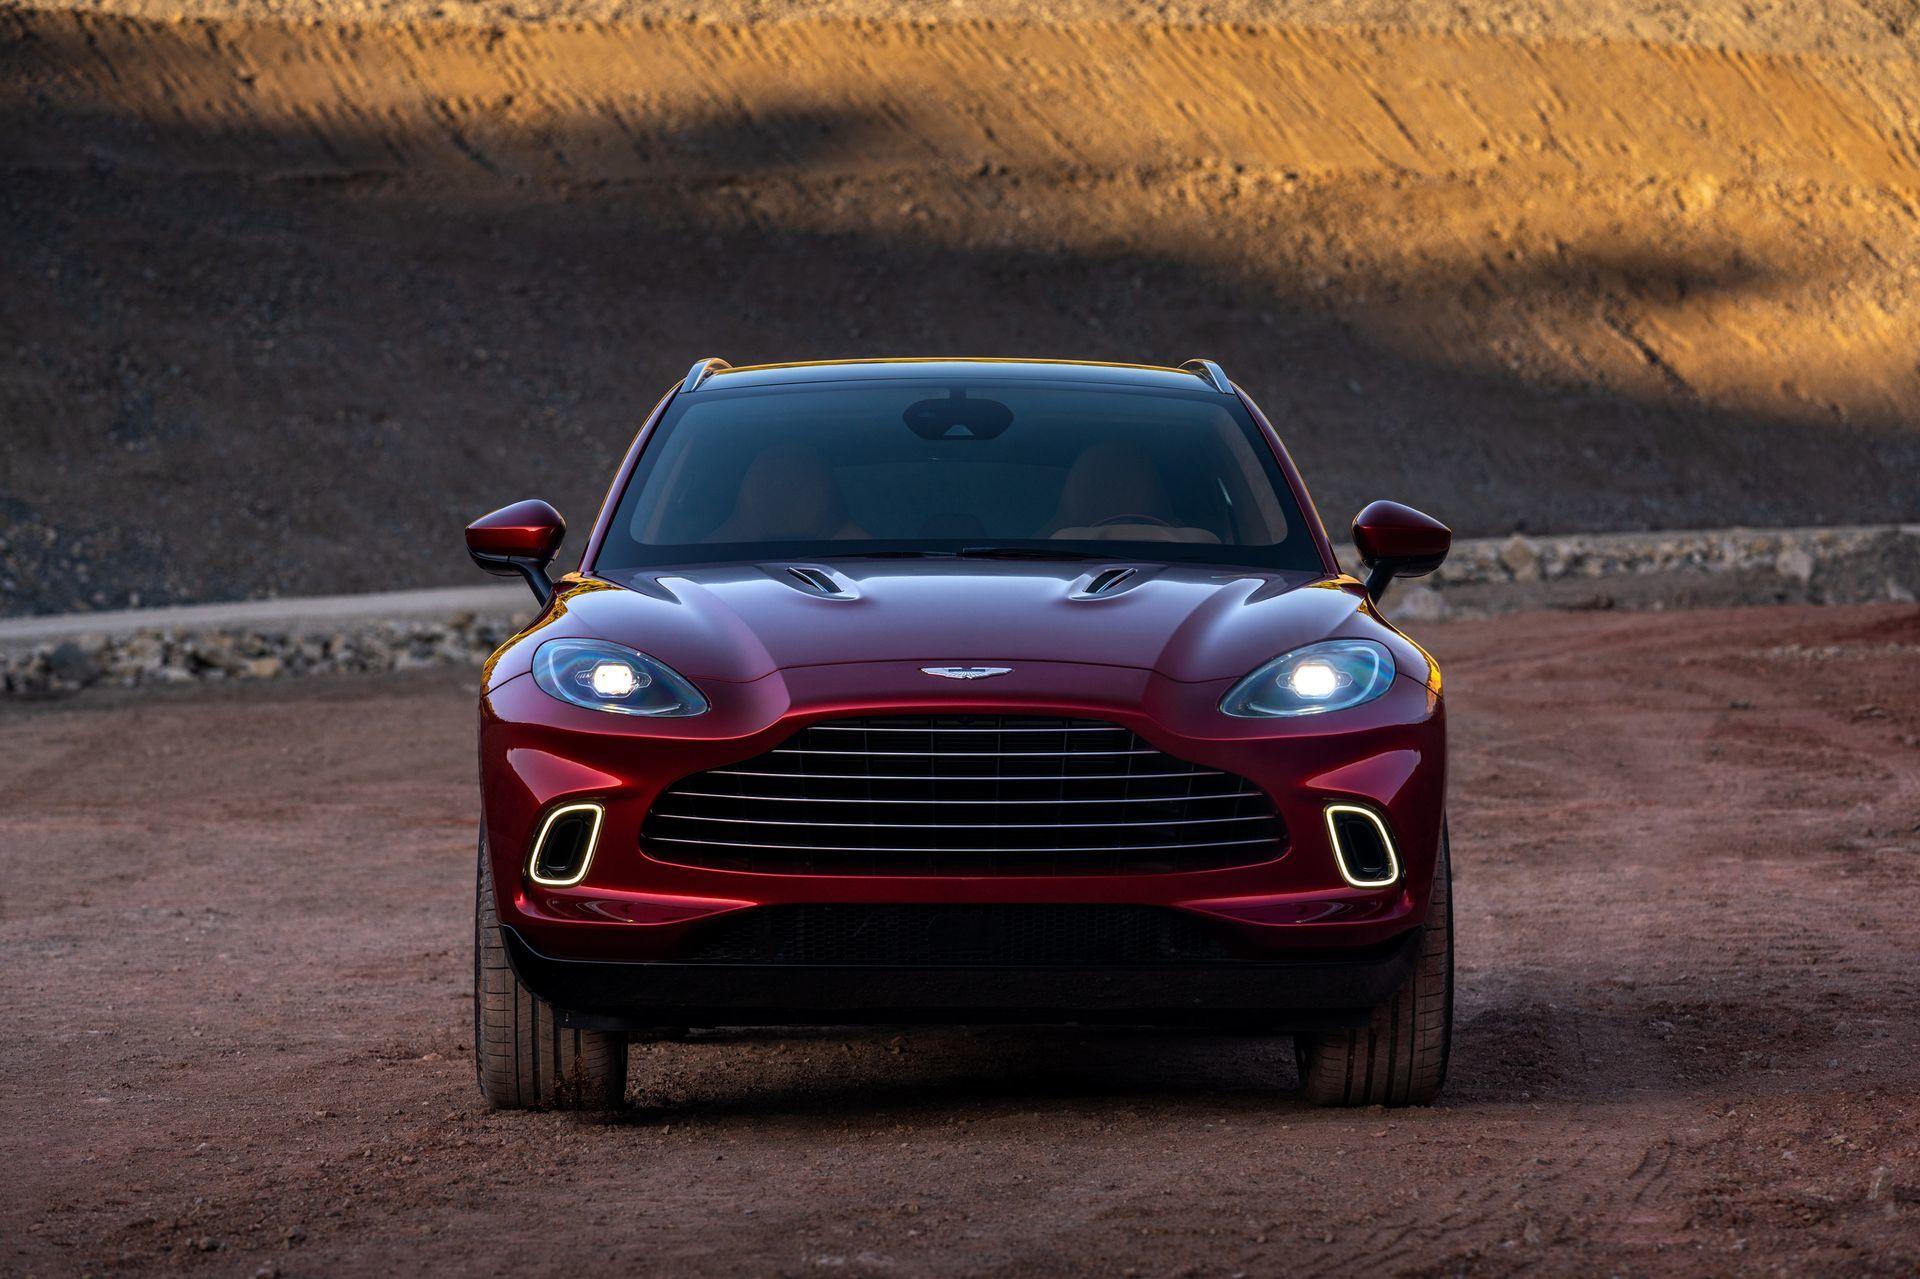 Aston Martin Dbx Fotos Oficiales 2